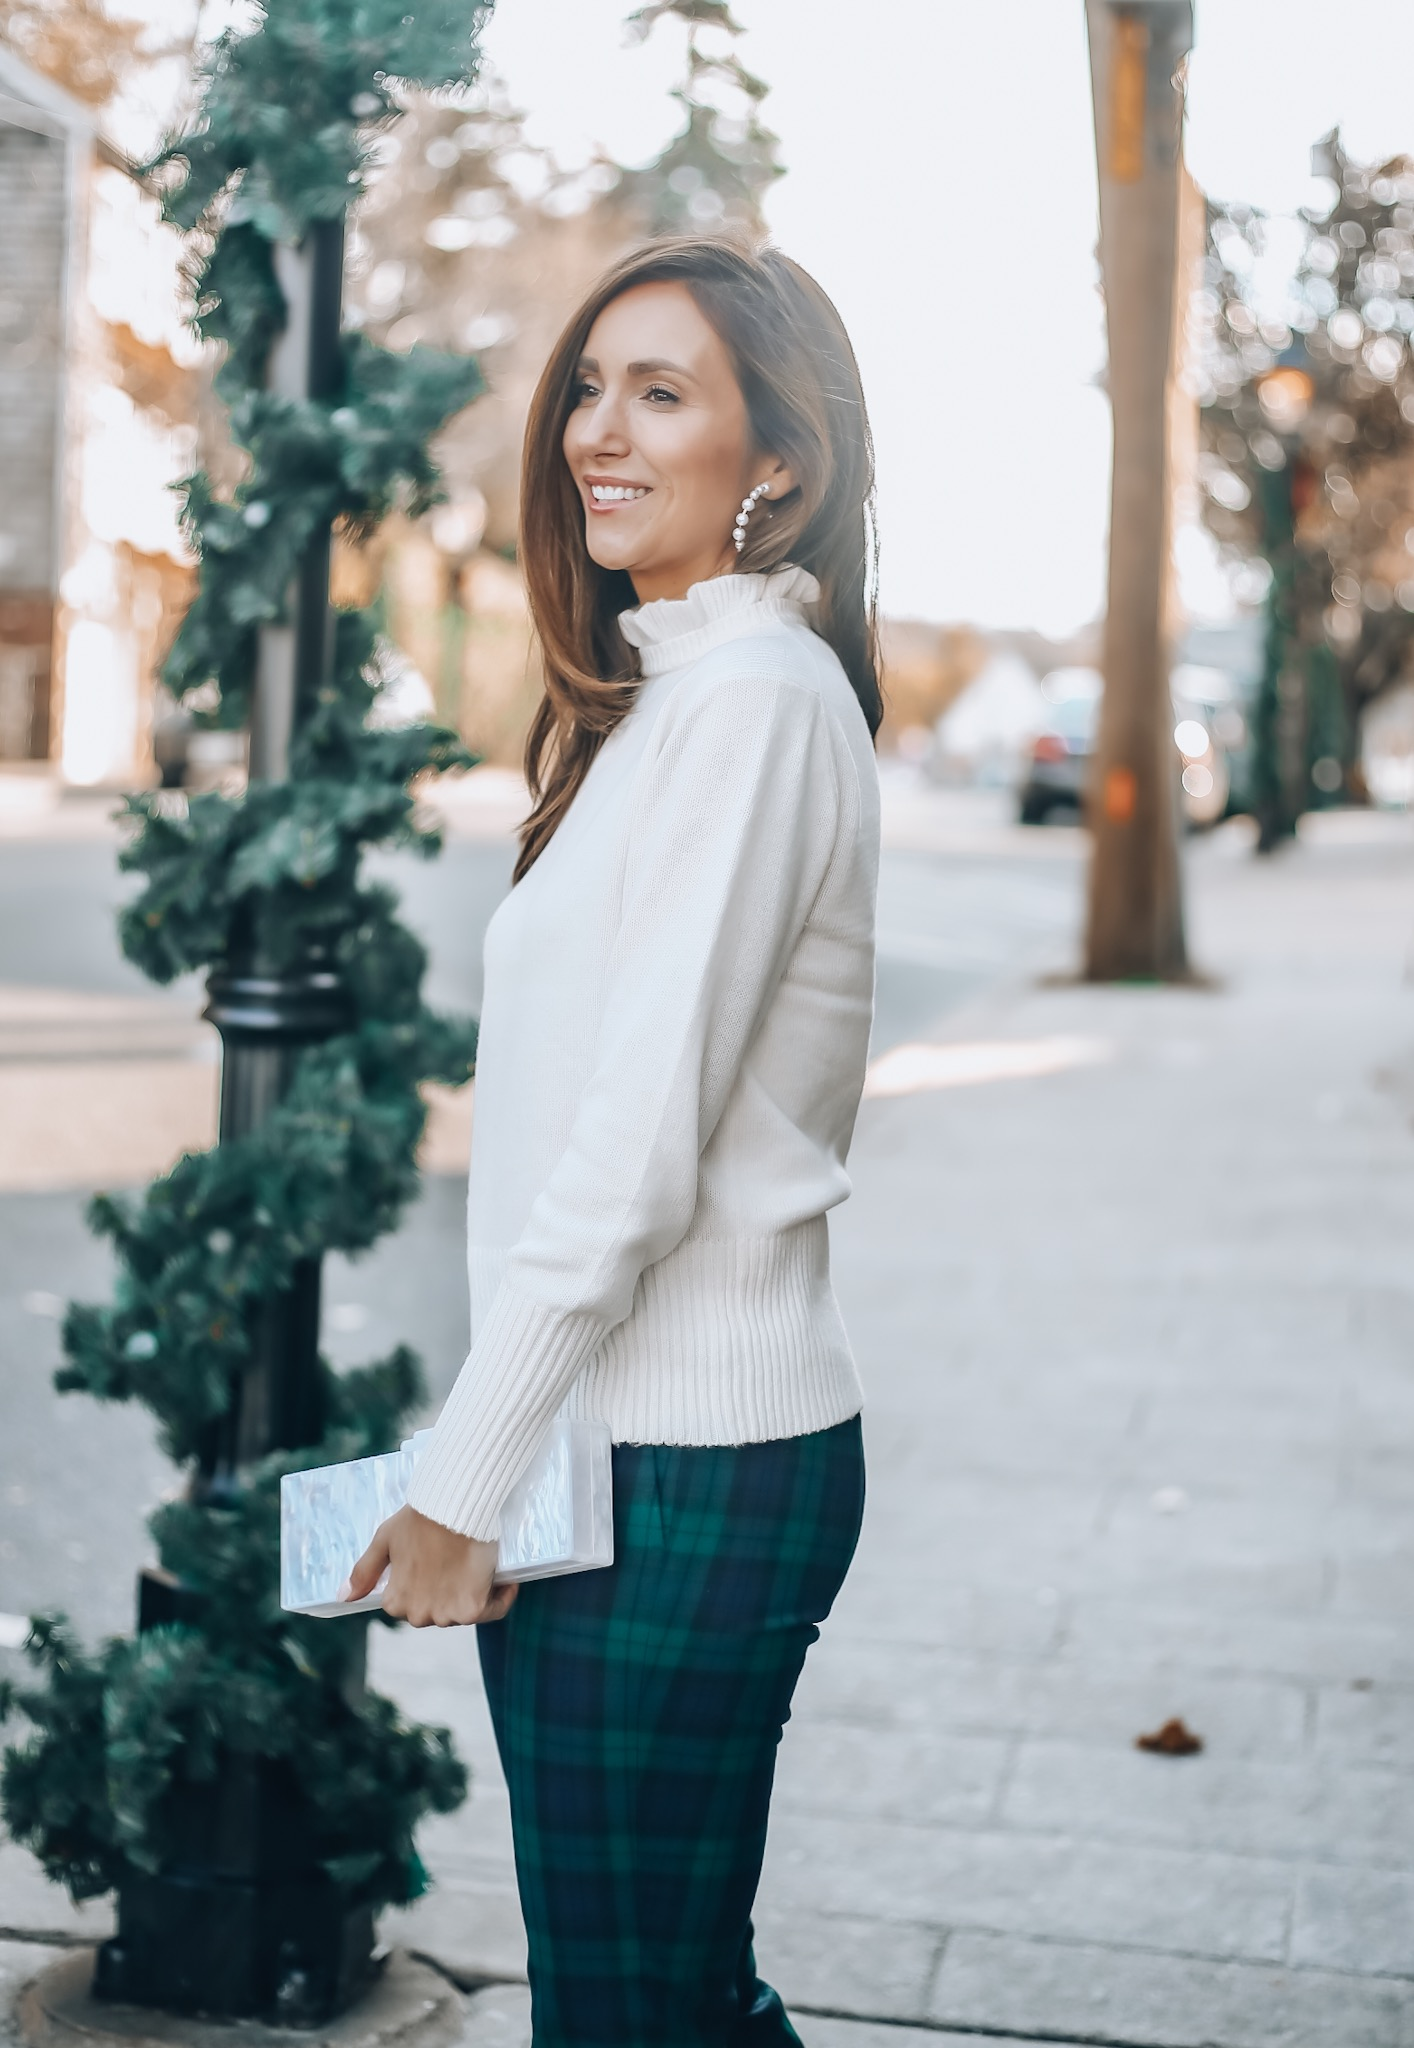 Sweater, plaid pants, j. crew holiday style